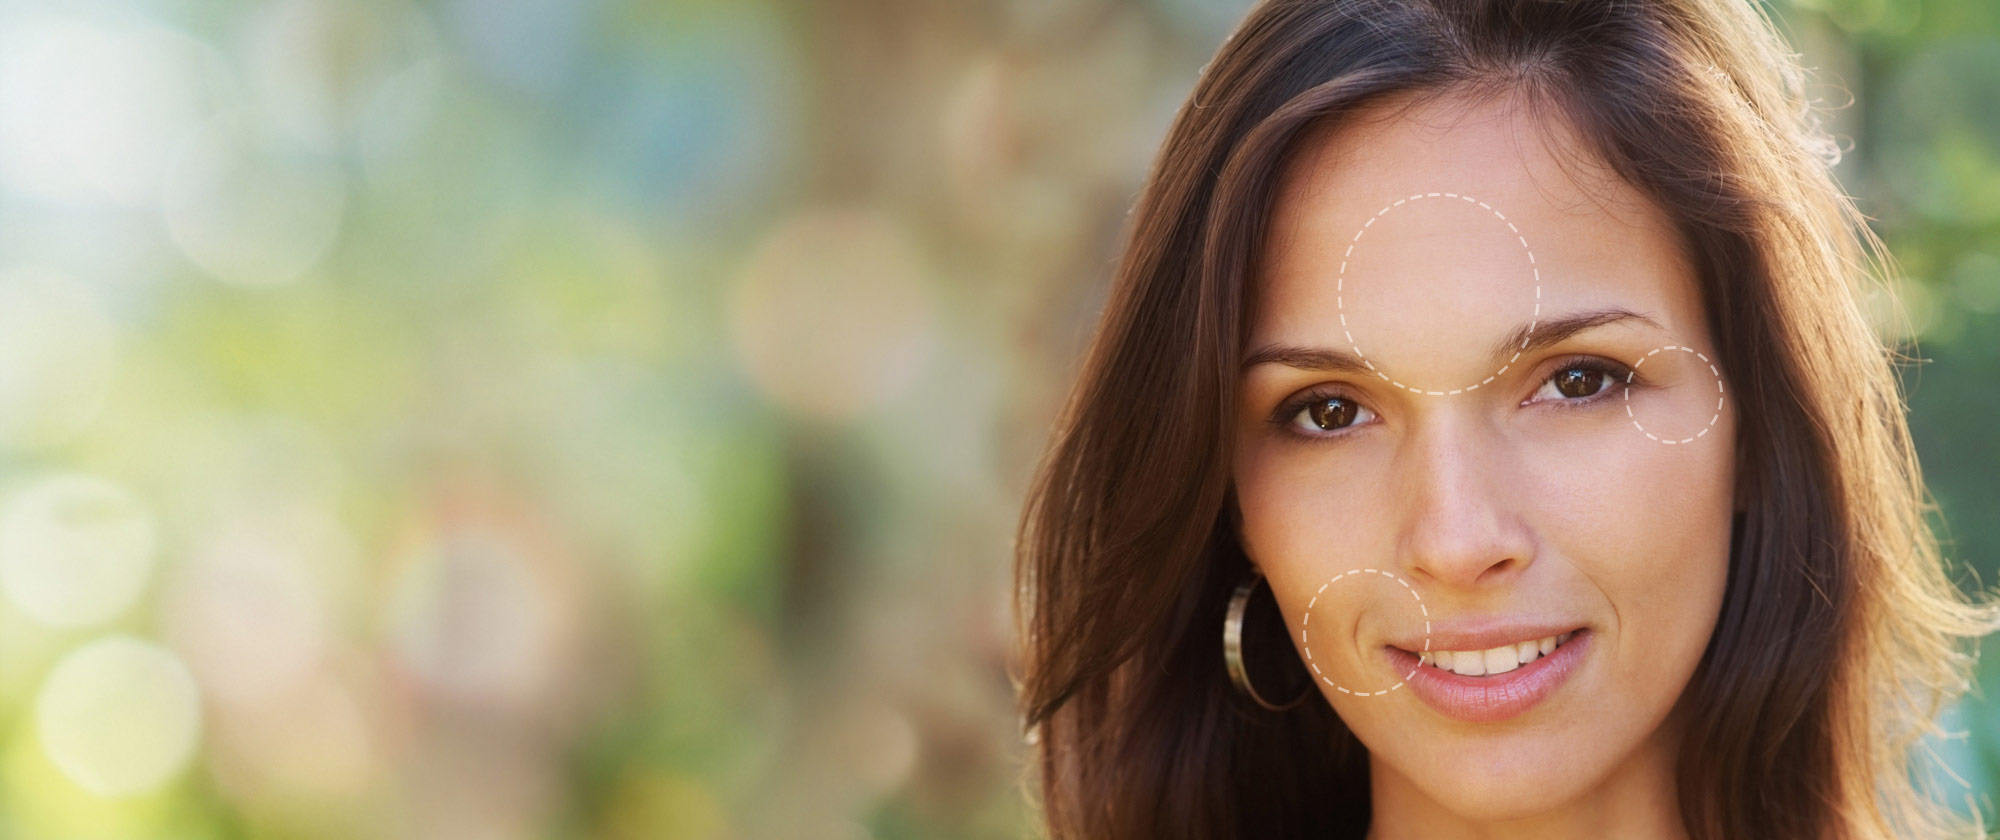 Portrait retouching service reduces wrinkles & makes cheek lift effect.